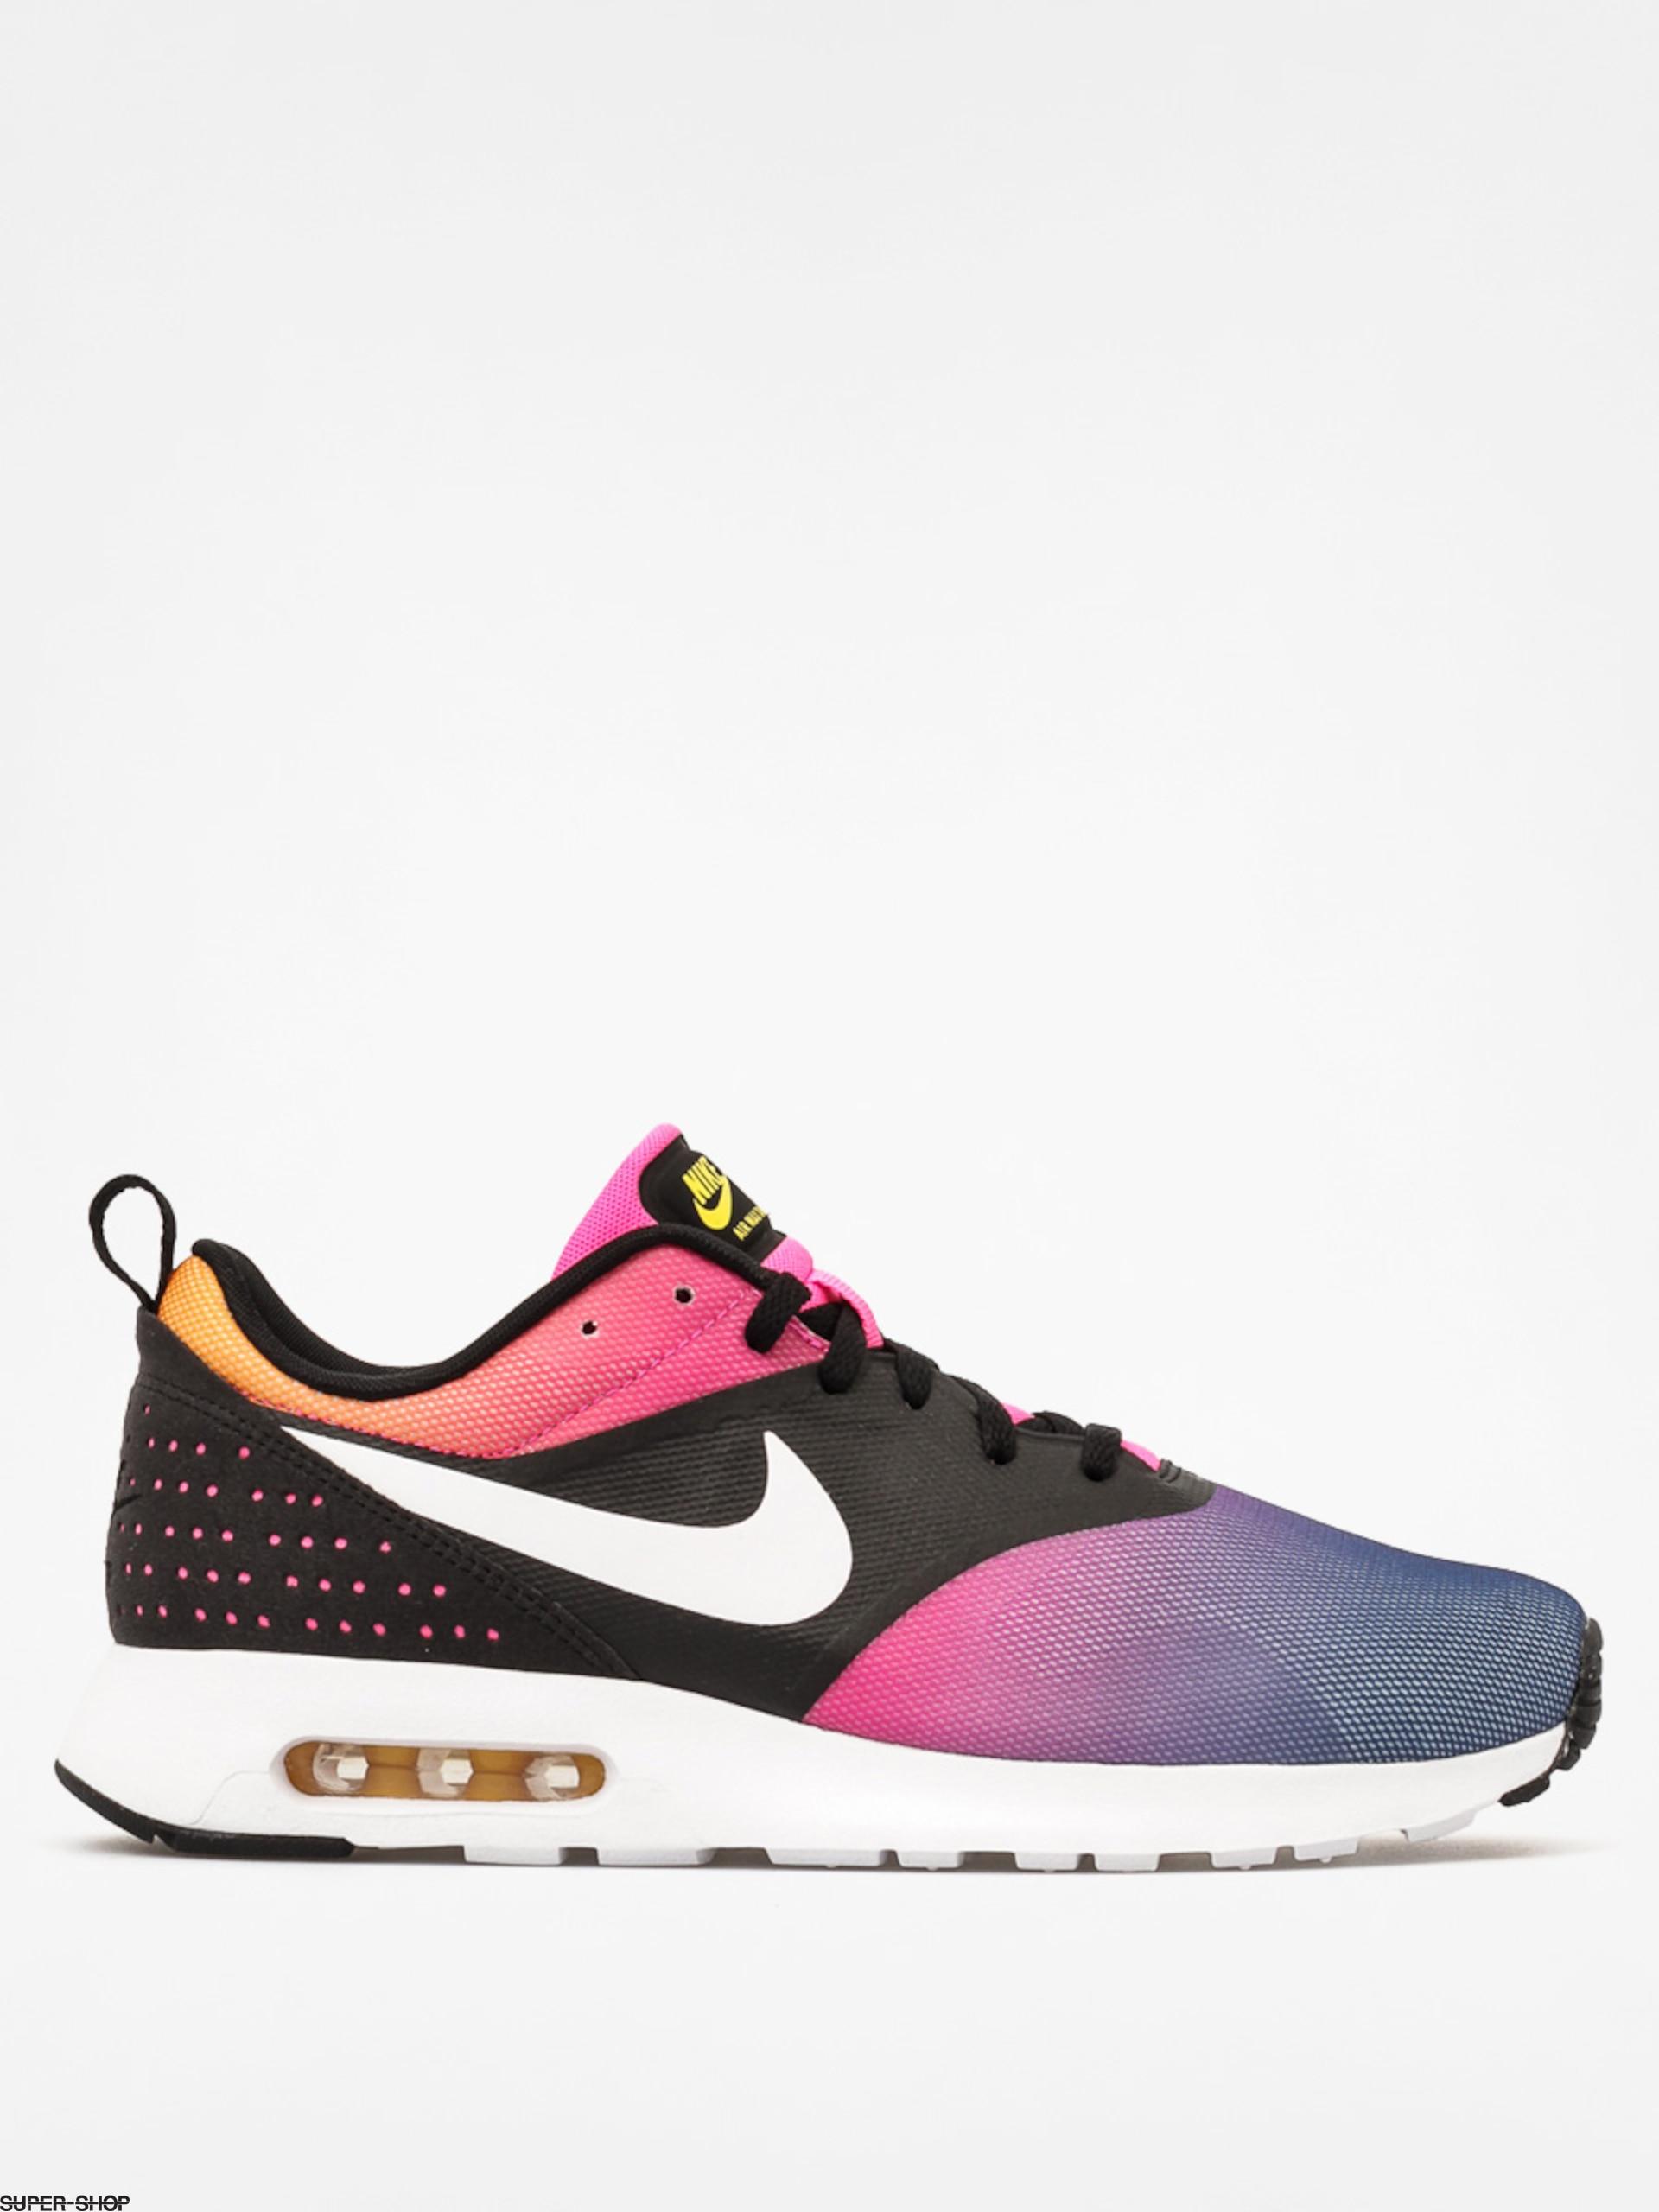 pretty nice 10d56 cbf90 3f20a 22e94  inexpensive nike shoes air max tavas sd black white pink pow  tr yellow e2094 22a8d